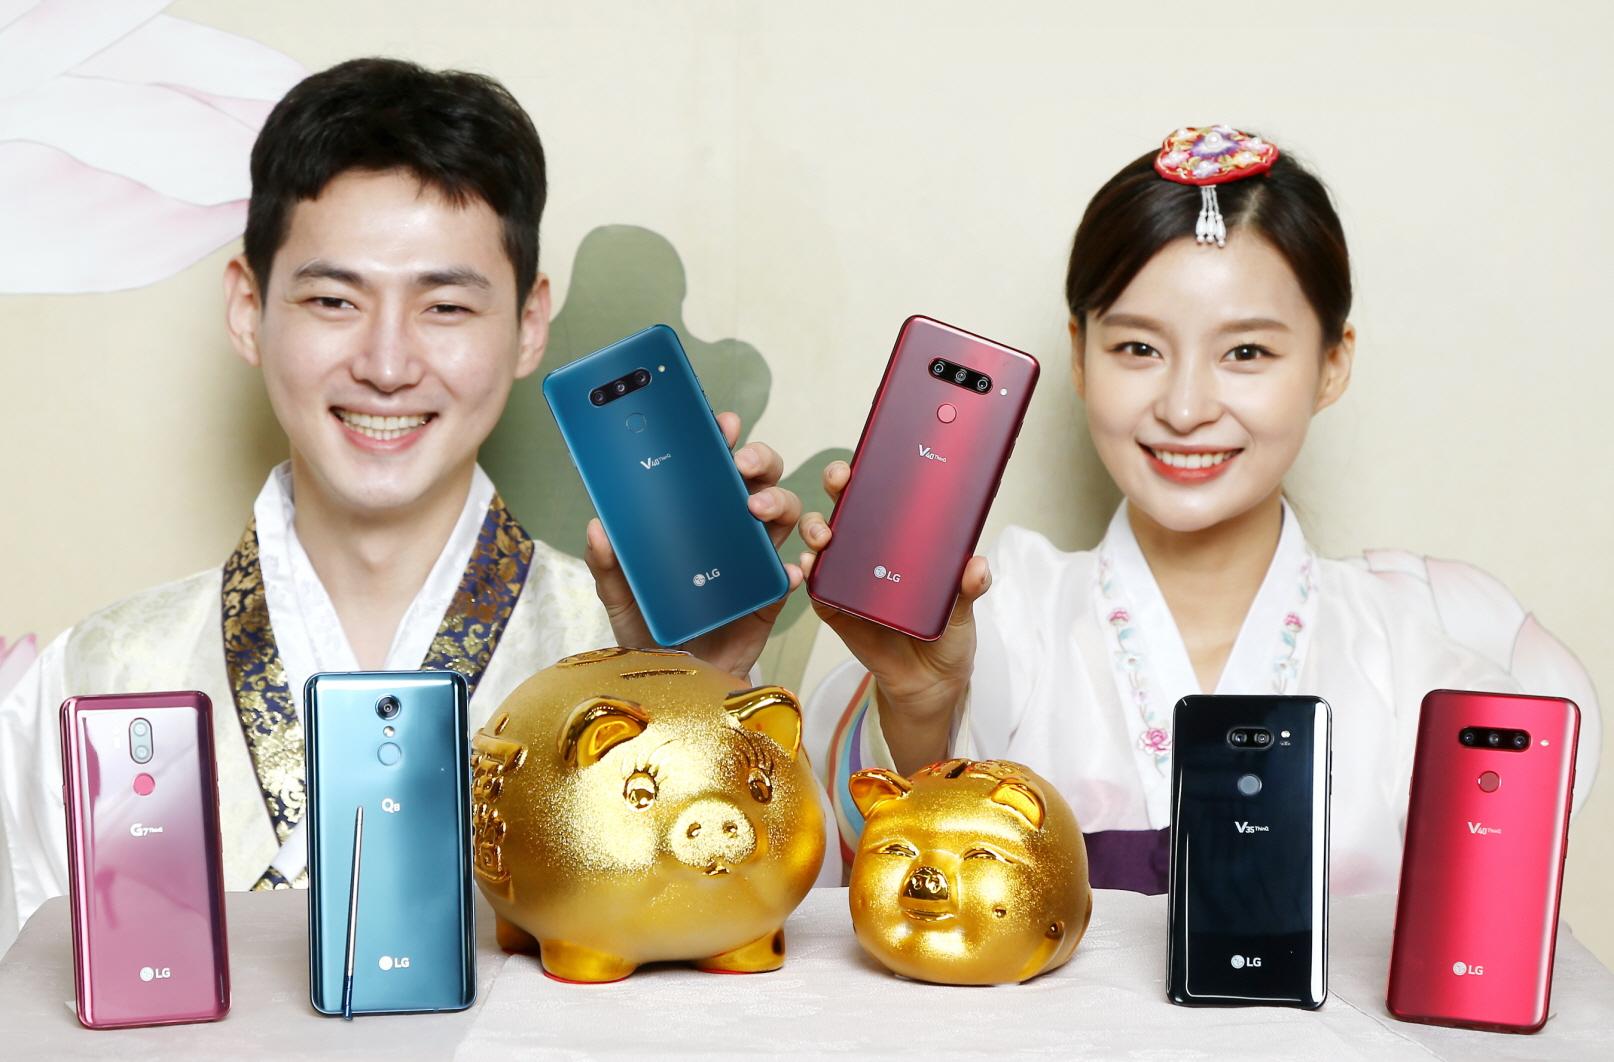 LG 스마트폰, 새해맞이 다양한 구매혜택 쏜다